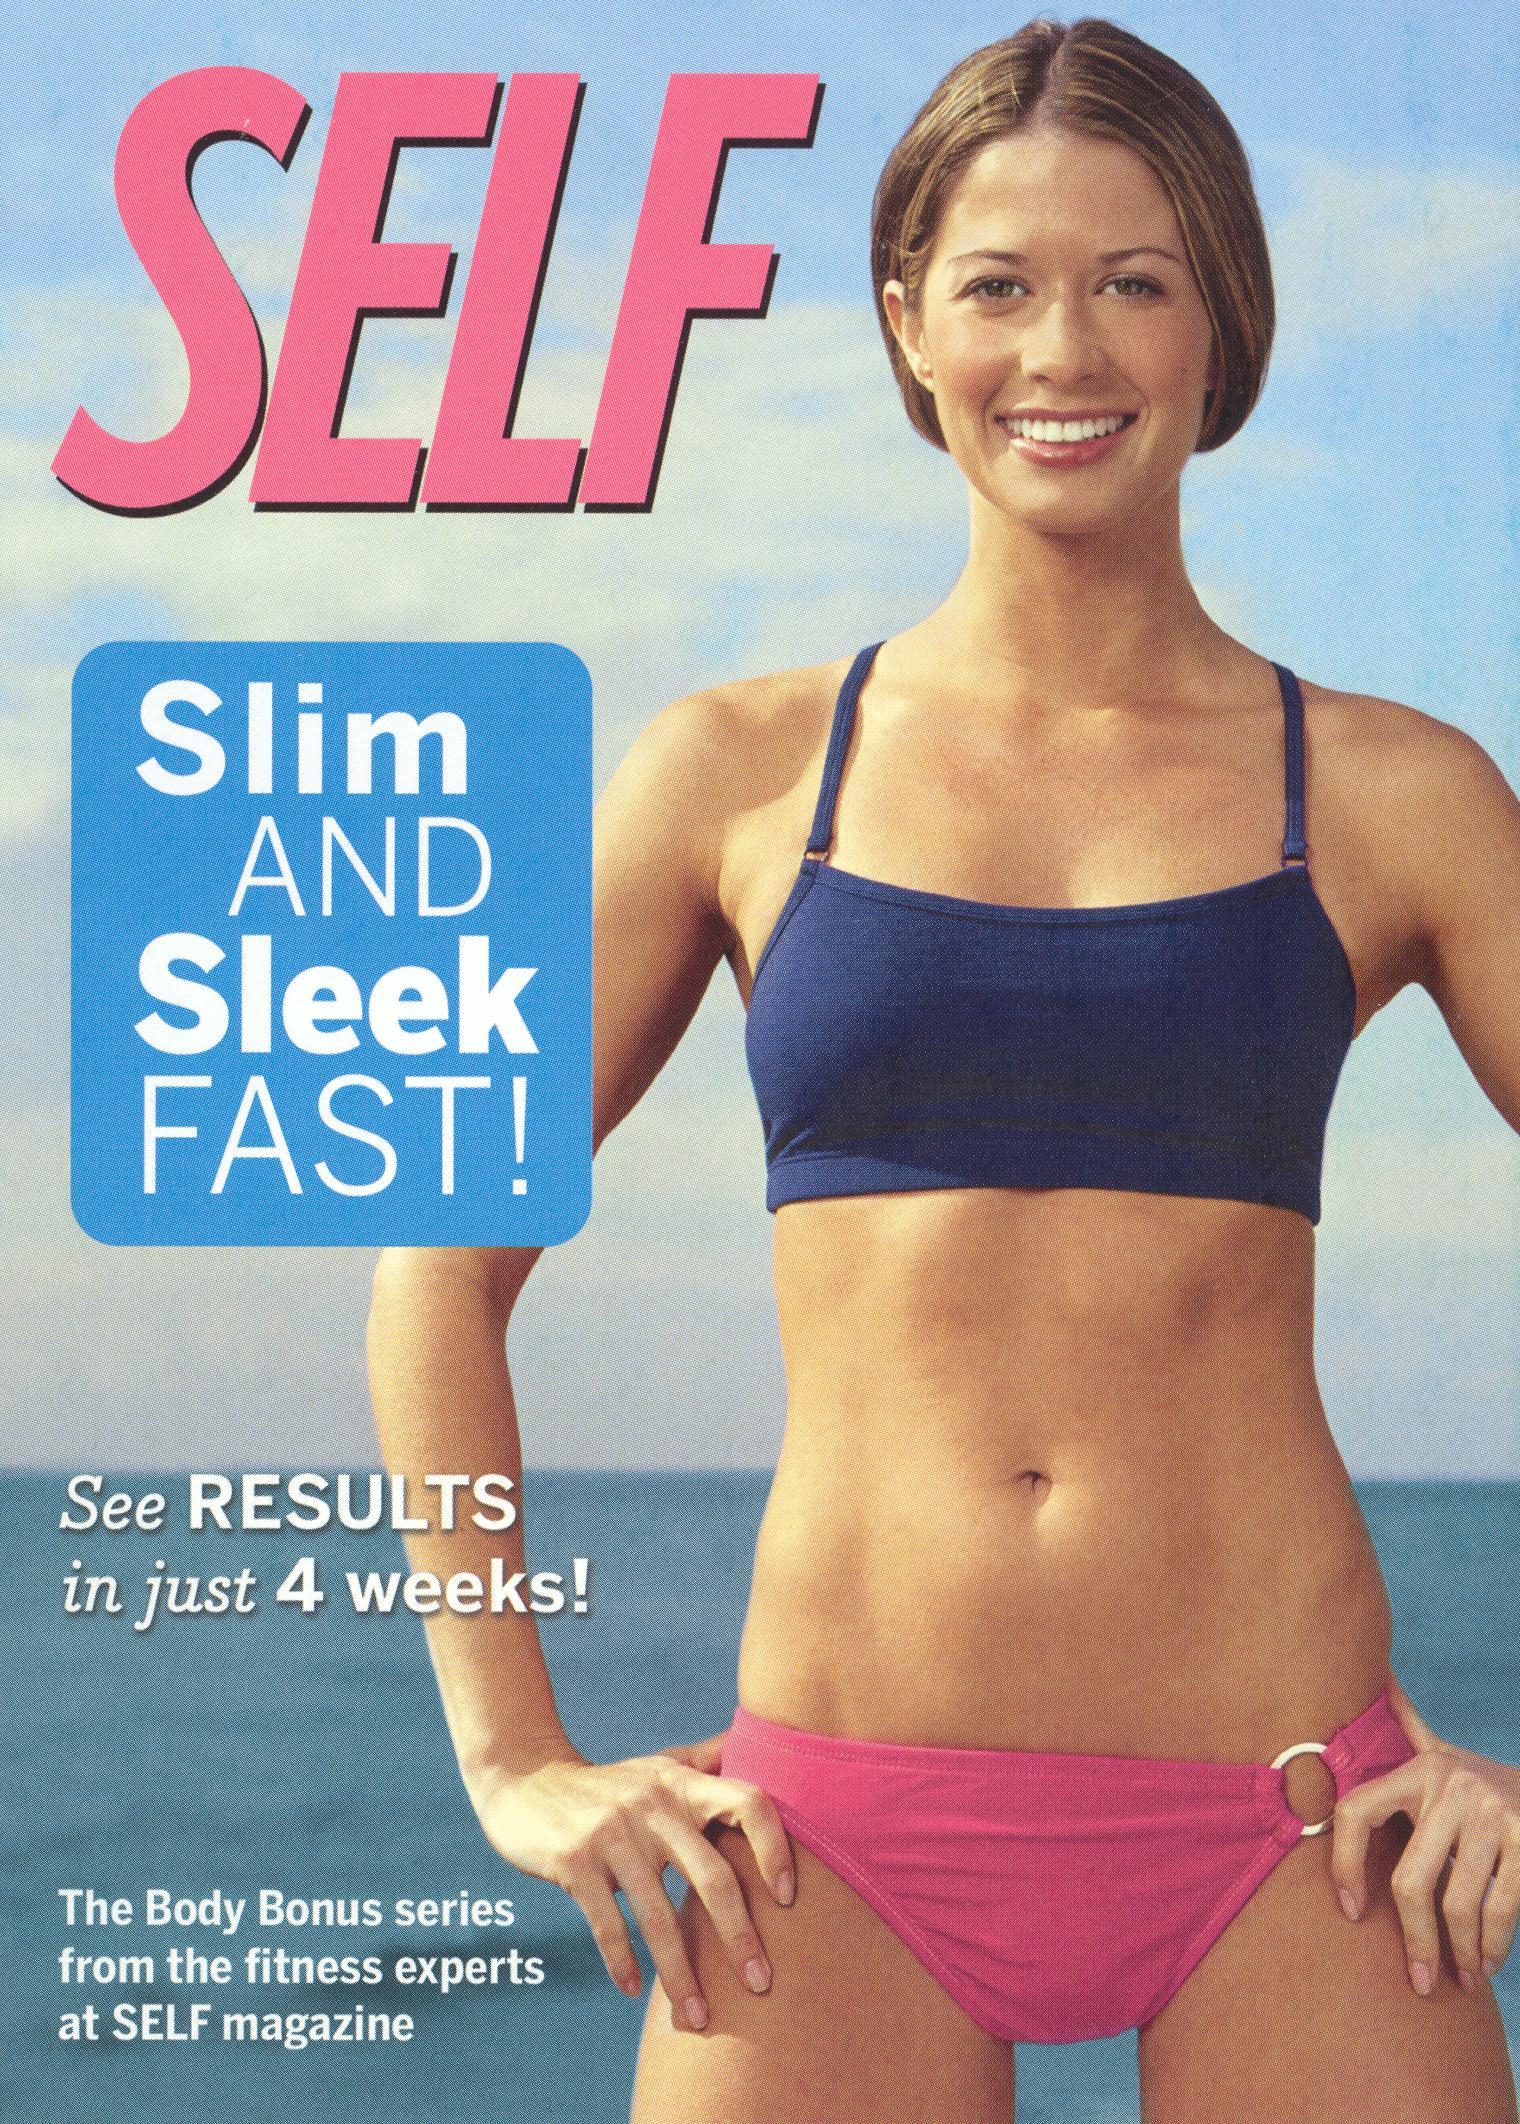 Self: Slim and Sleek Fast!